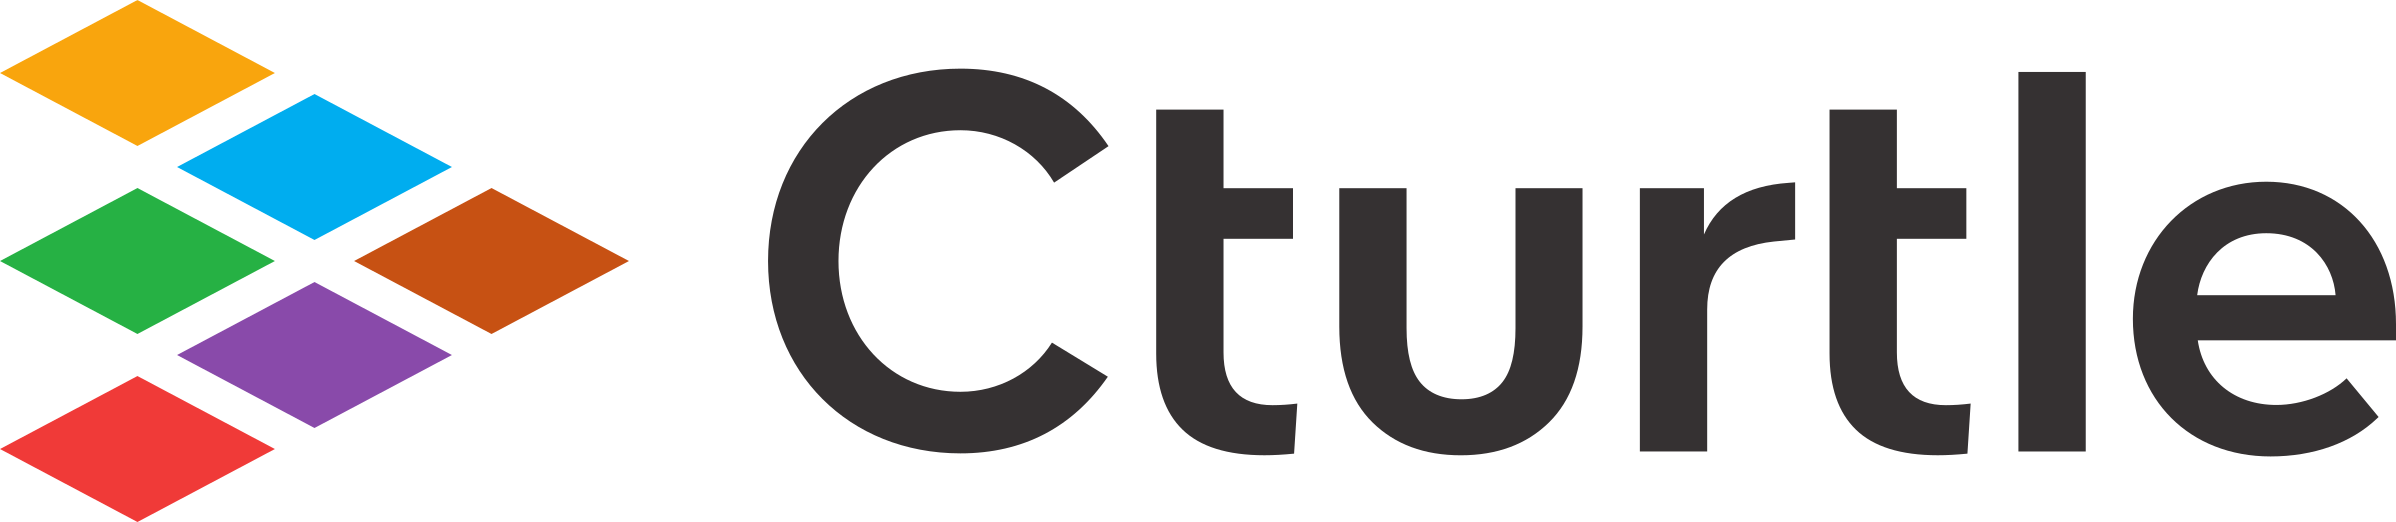 Cturtle